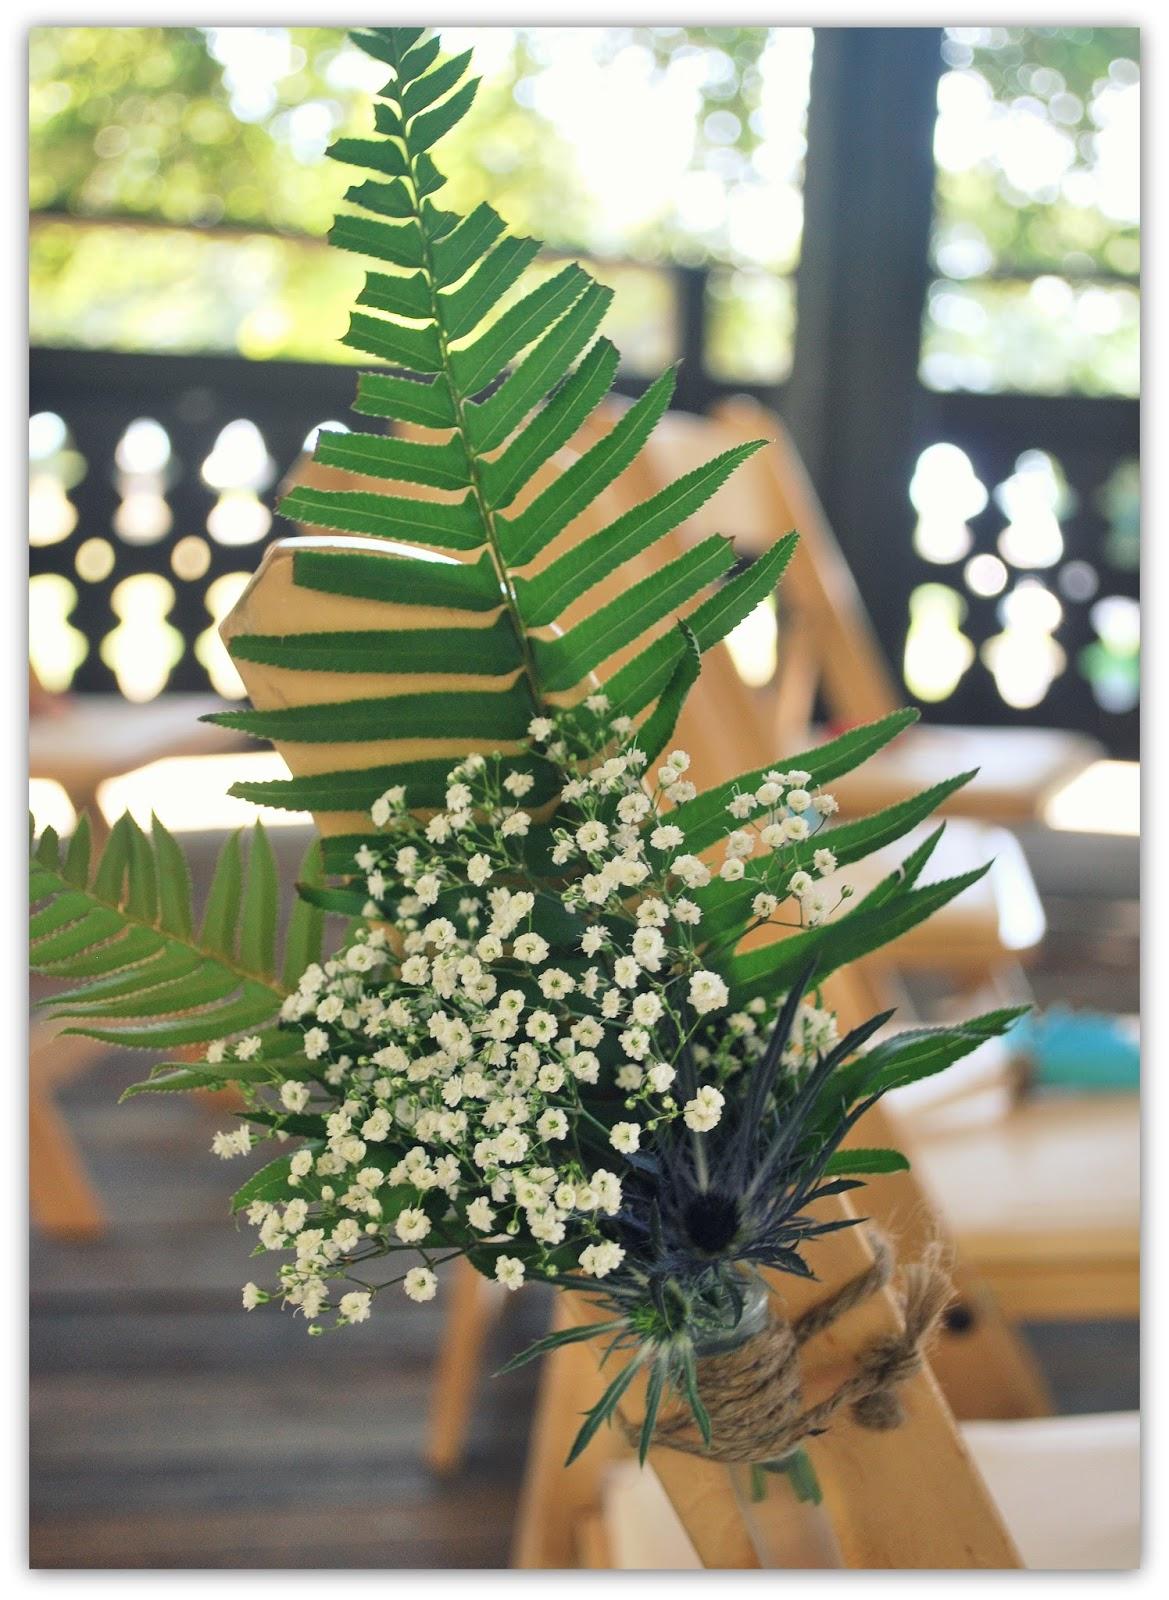 Tomlinson Plant Design